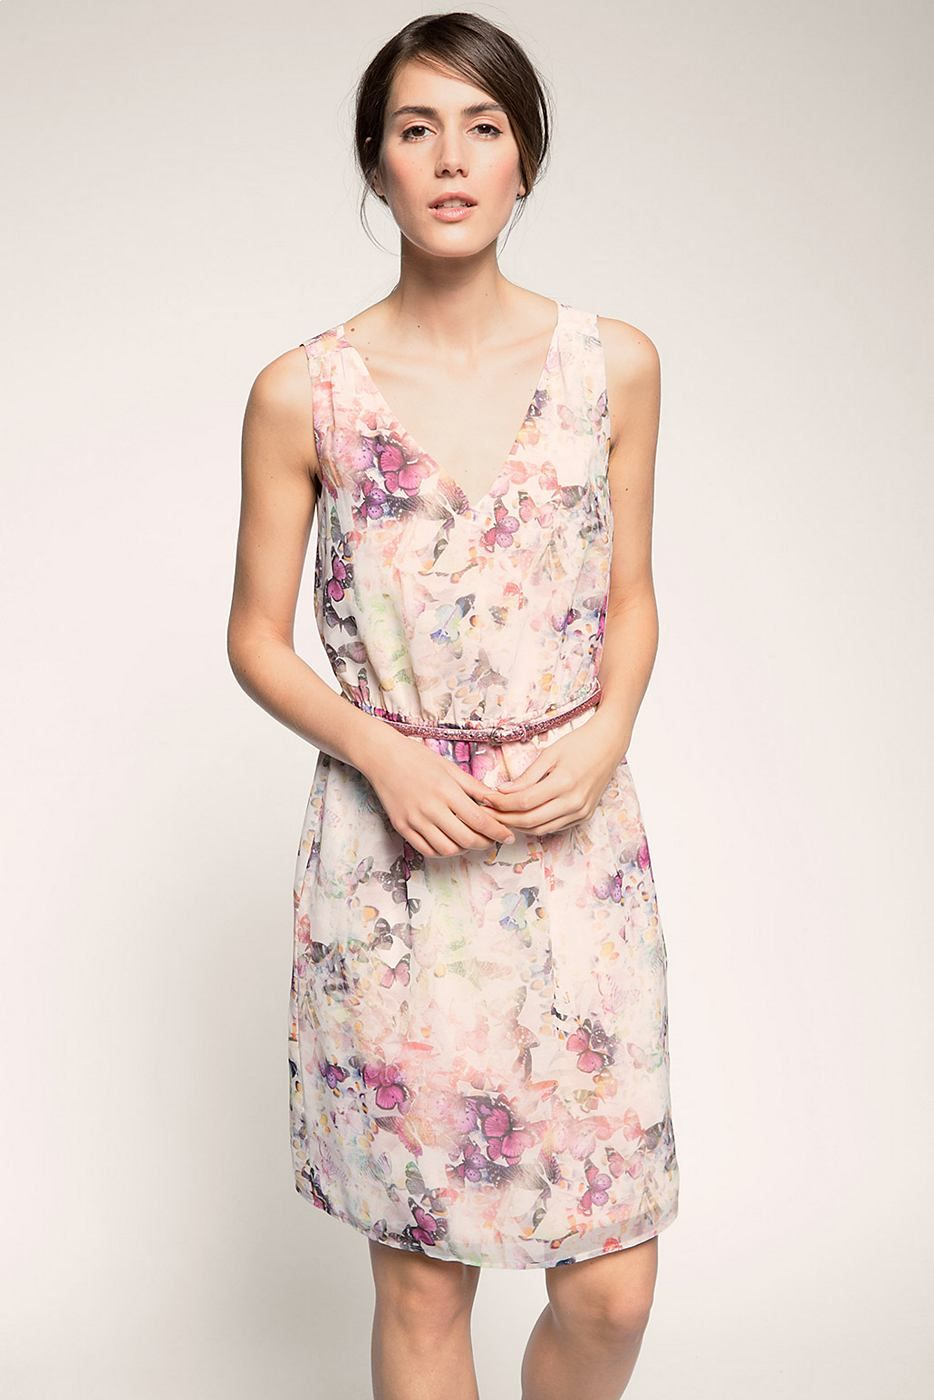 Esprit feminines kleid aus zartem chiffon